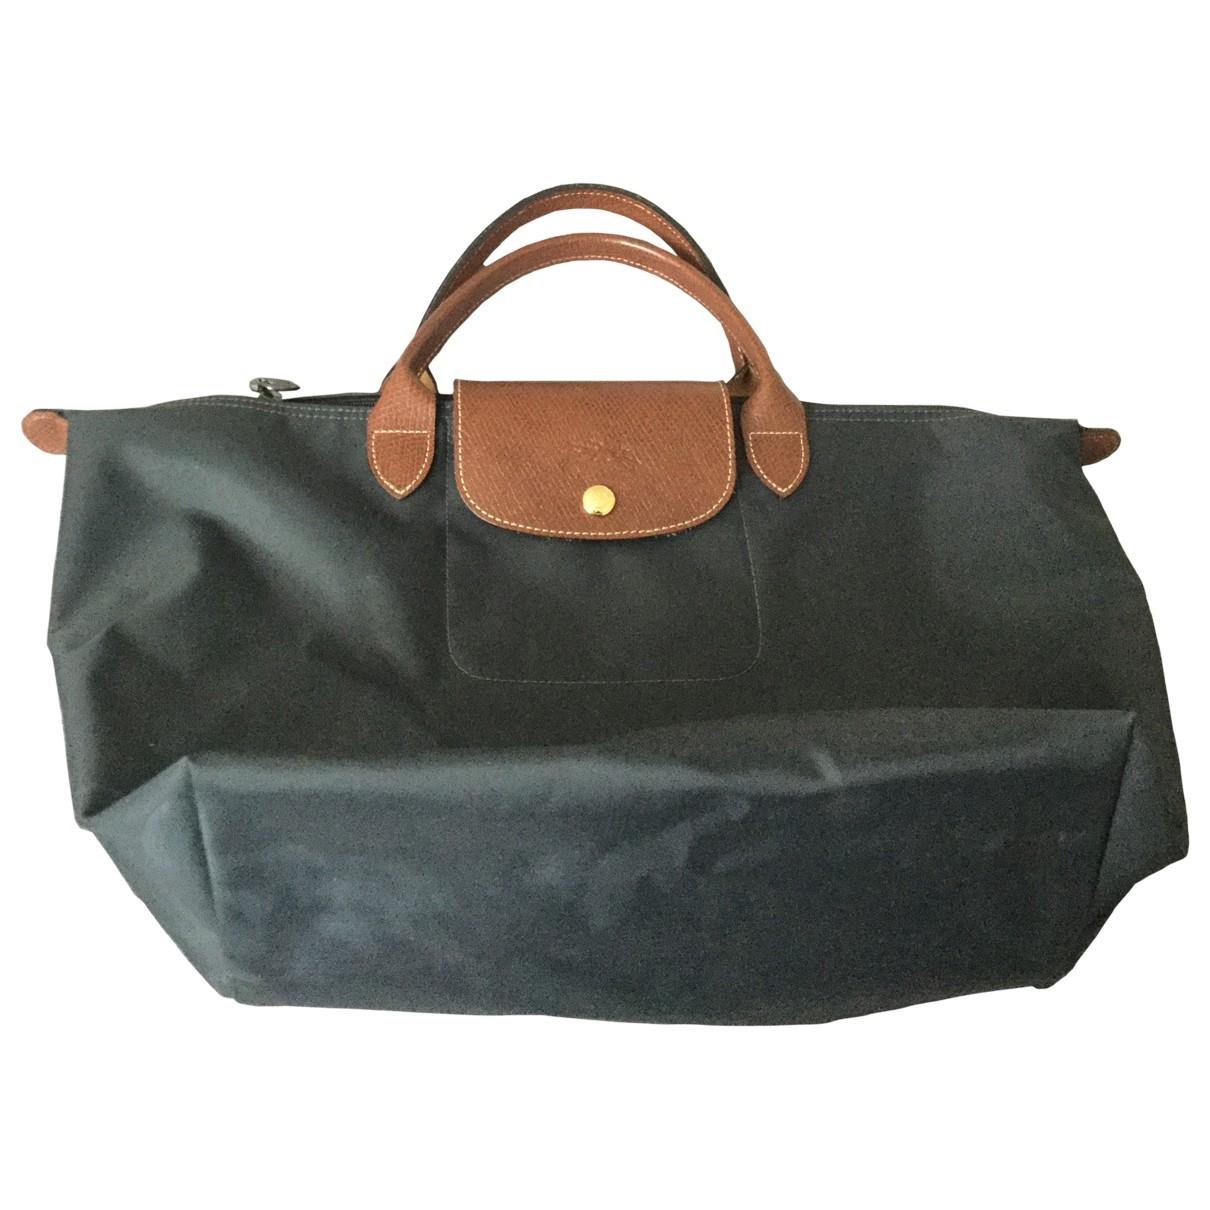 Bolso  Pliage  de Lona Longchamp